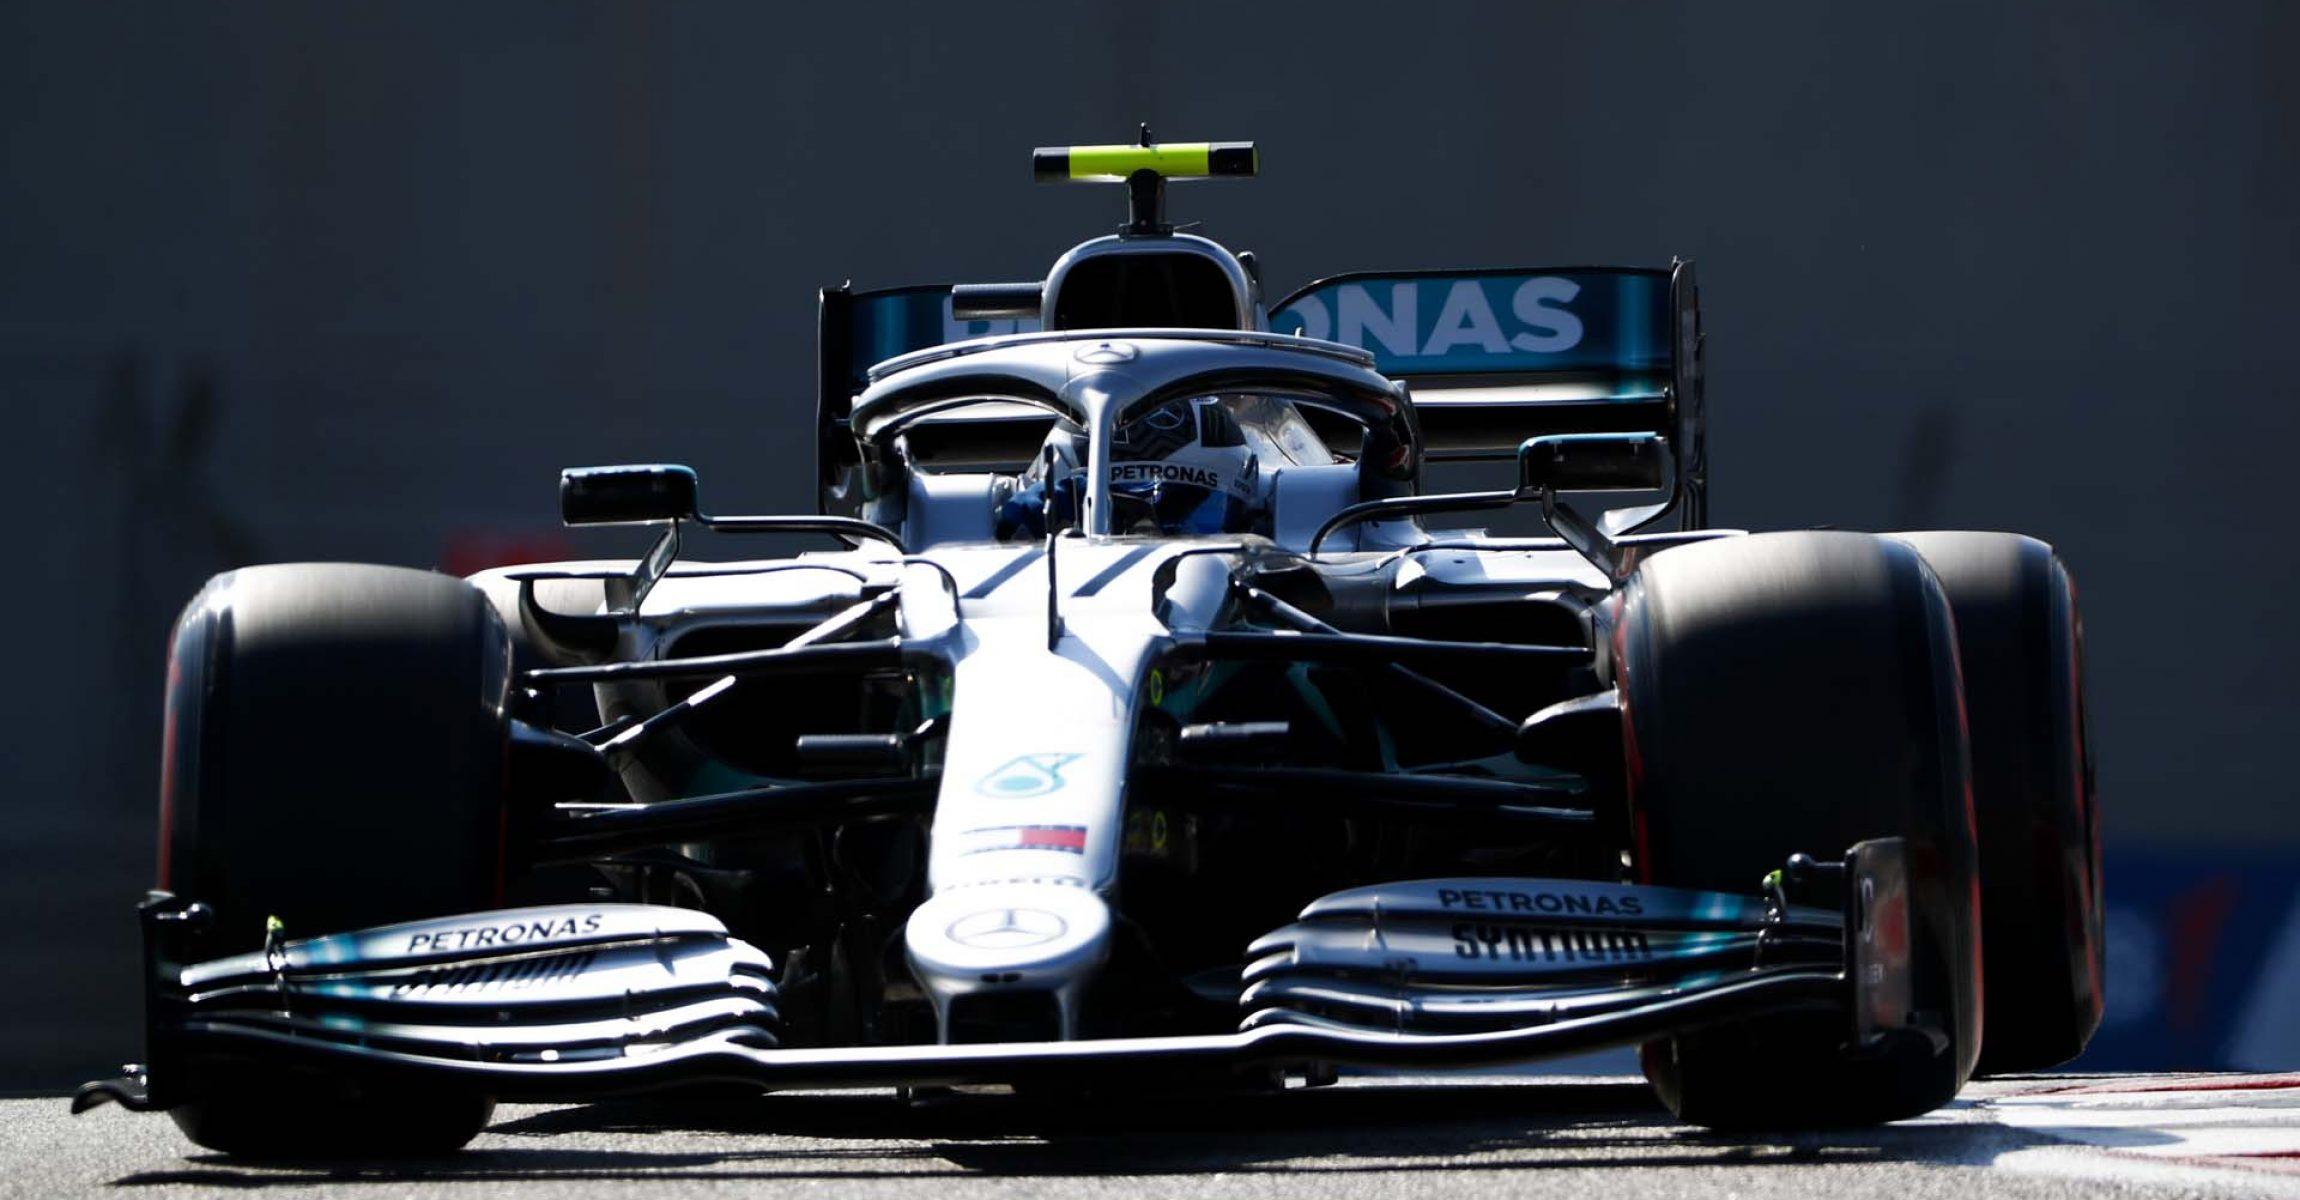 2019 Abu Dhabi Grand Prix, Friday - LAT Images Valtteri Bottas Mercedes